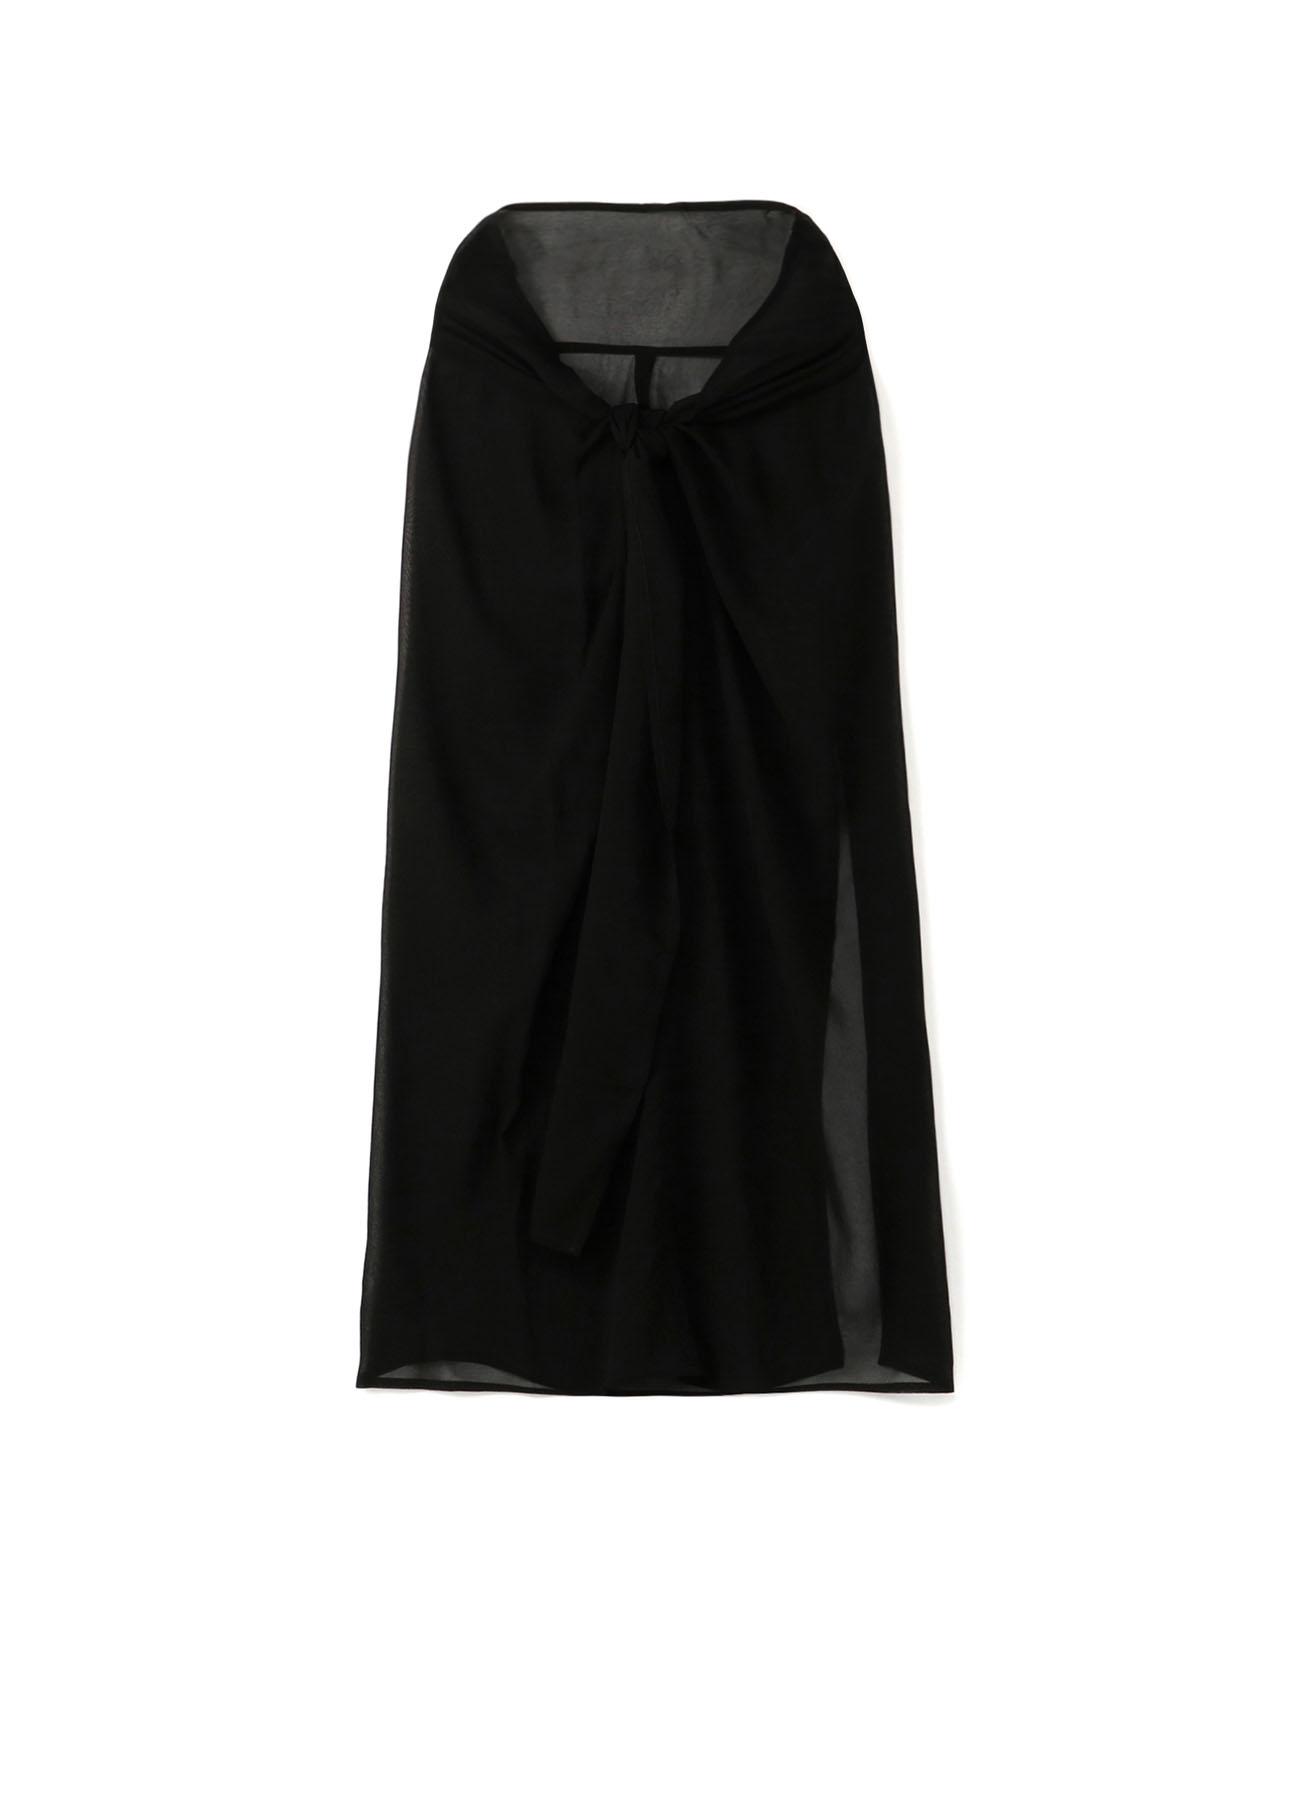 Cu/Chiffon Waist Knot Skirt